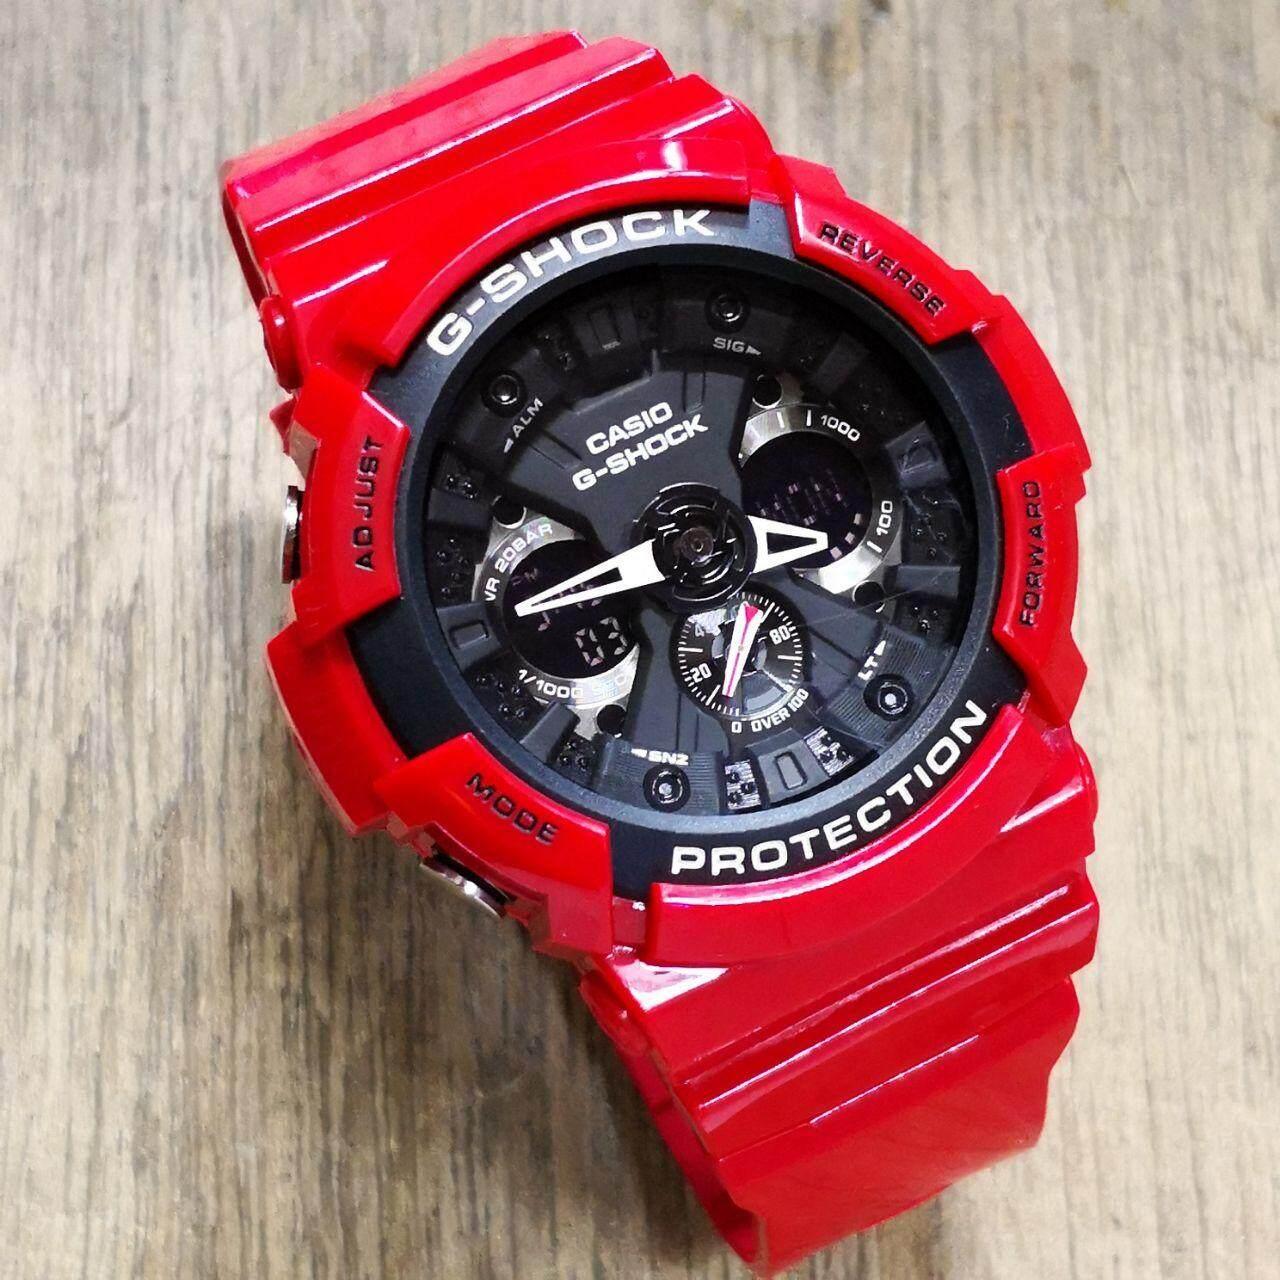 Features Casio G Shock Ga 110cs 4a Watch Iron Man Edition Crazy 100b 4adr 201